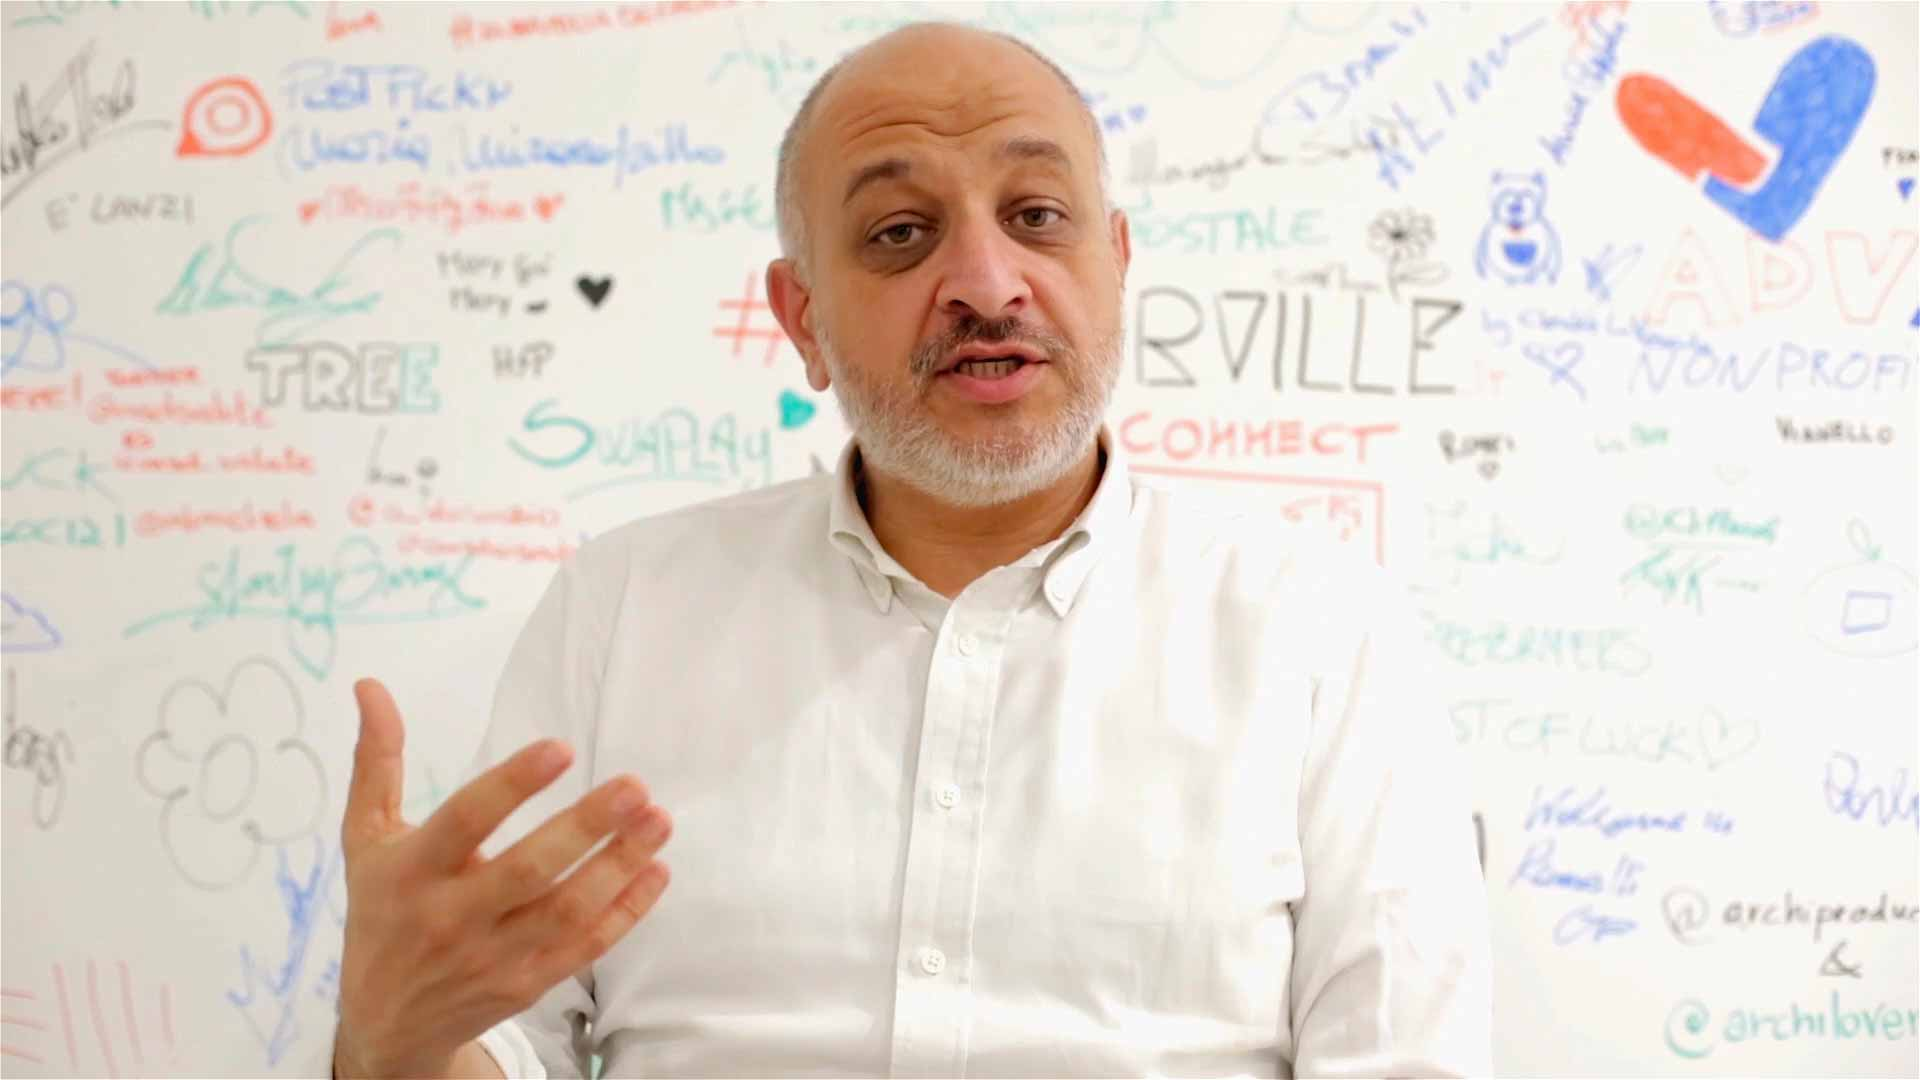 Nicola Mattina a Binario F Presenta lo Smart Community Lab